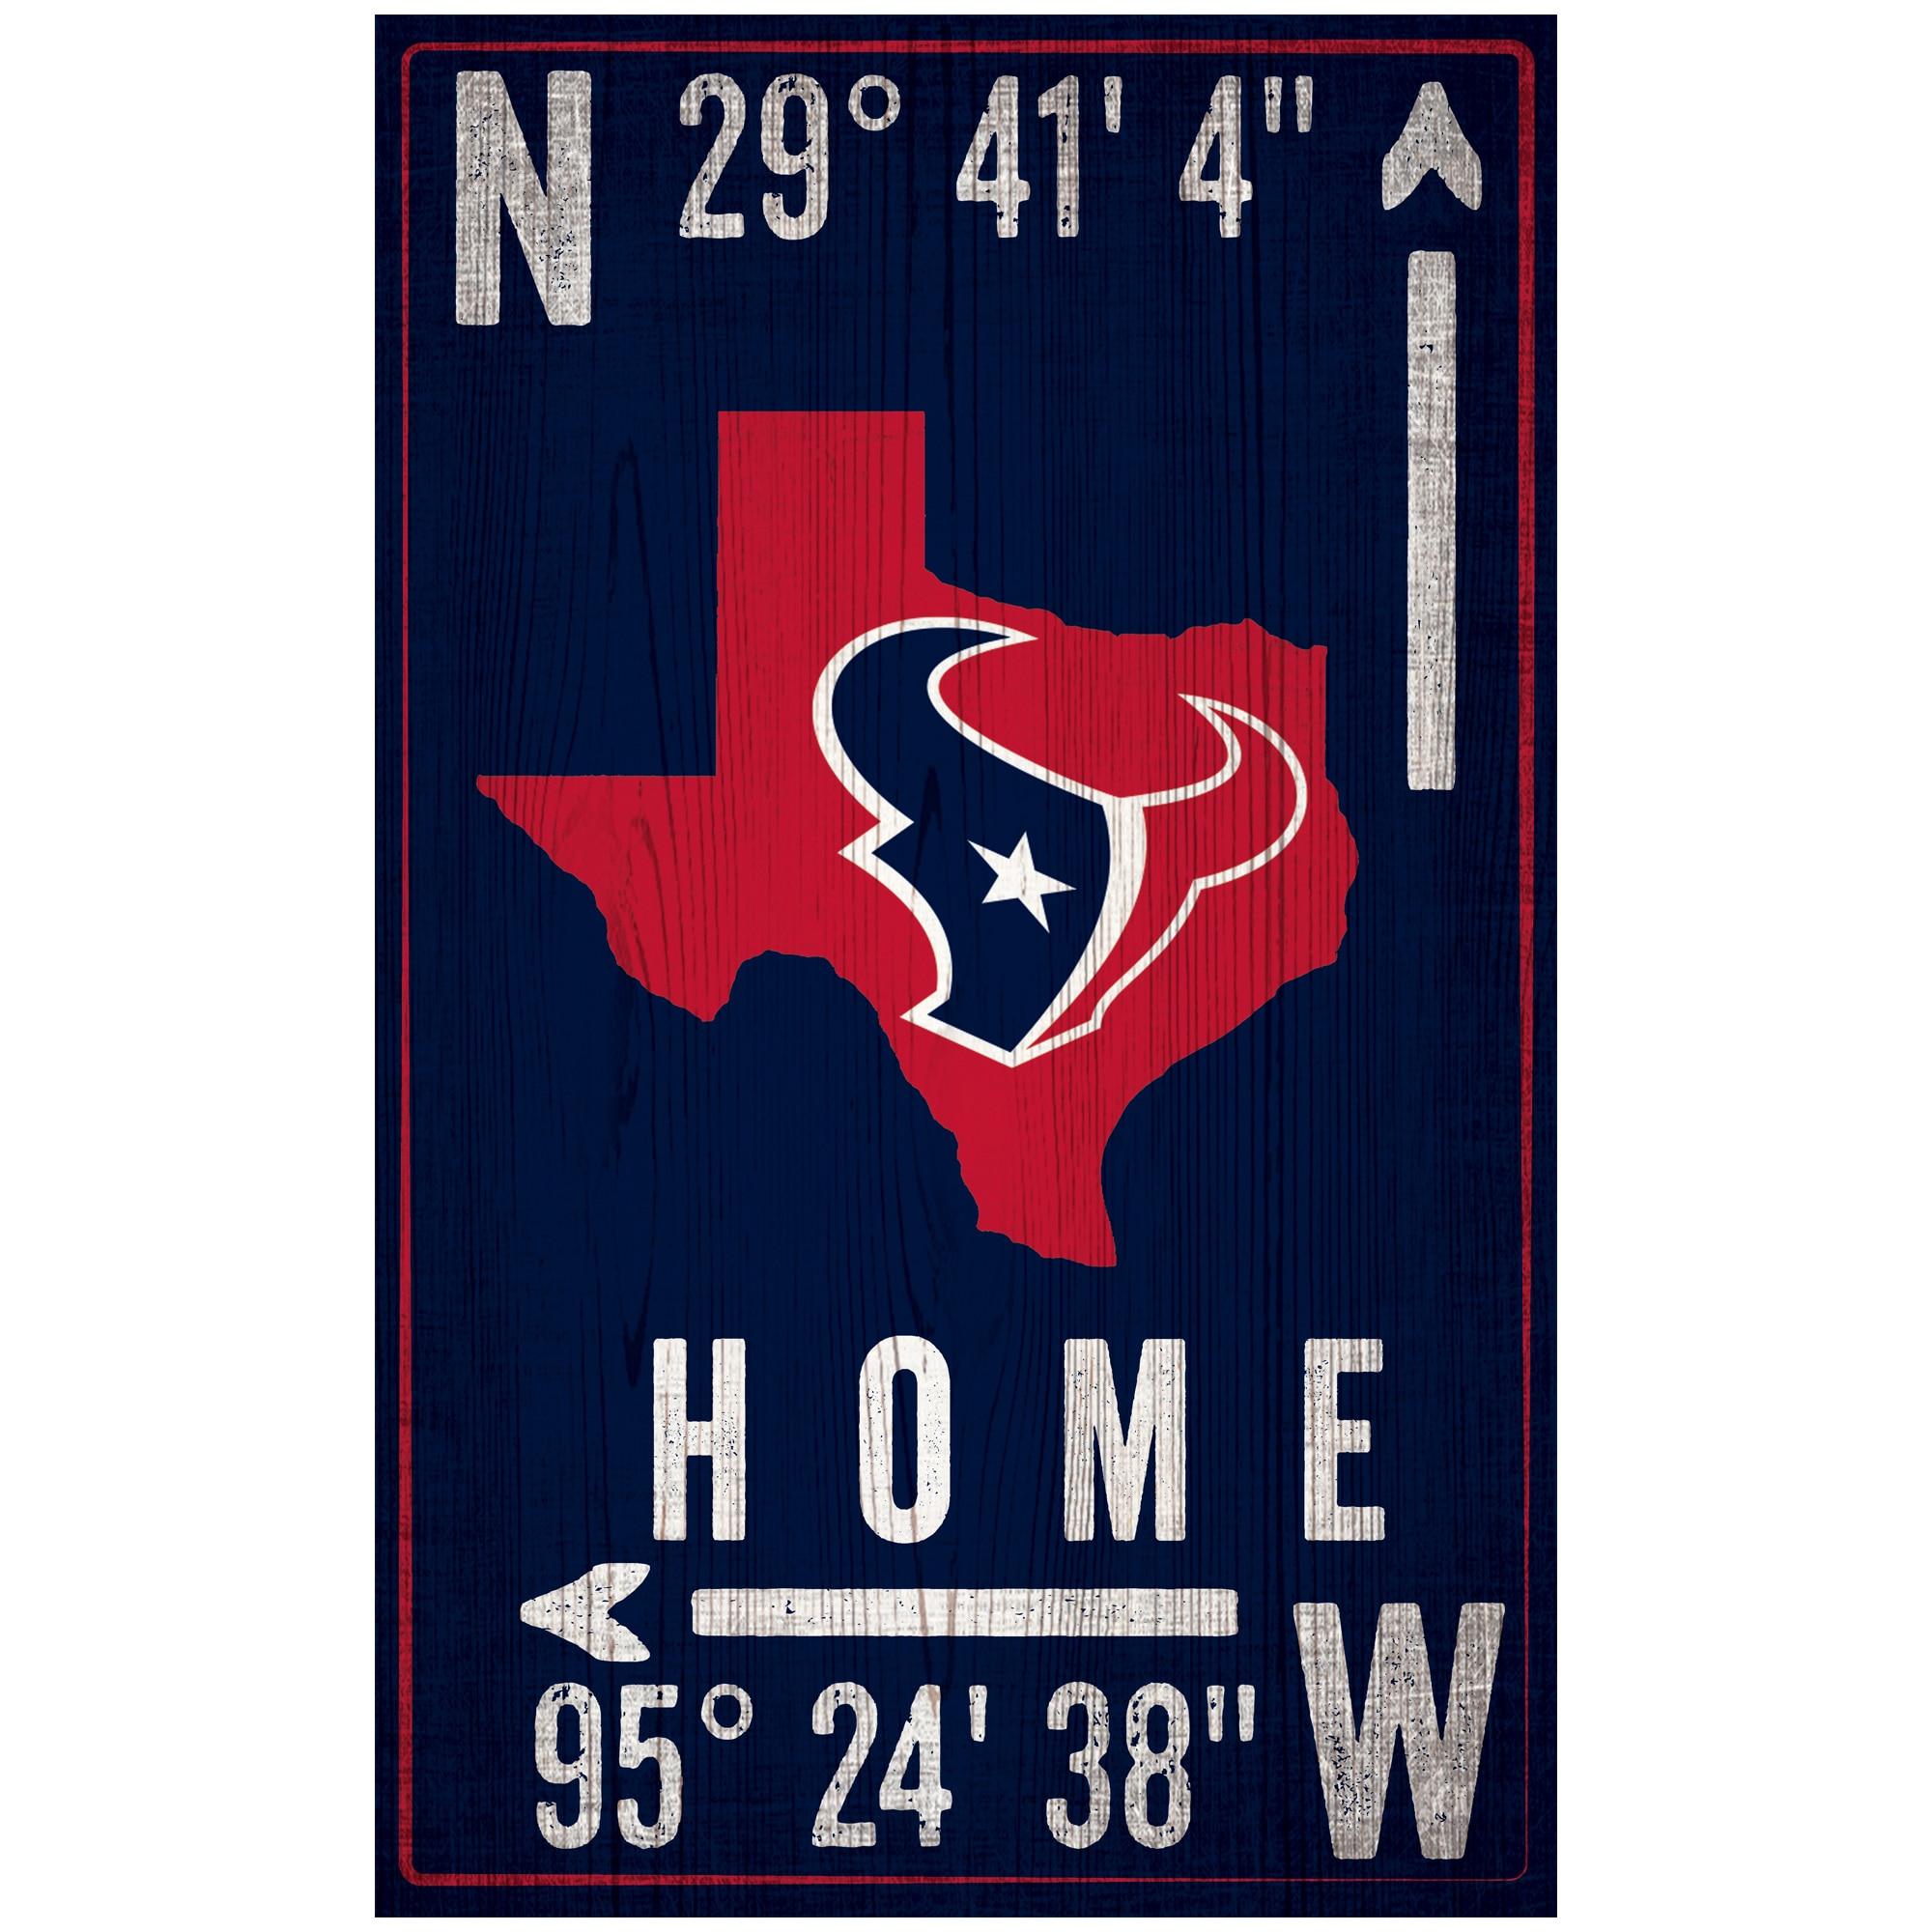 "Houston Texans 11"" x 19"" Coordinate Sign"